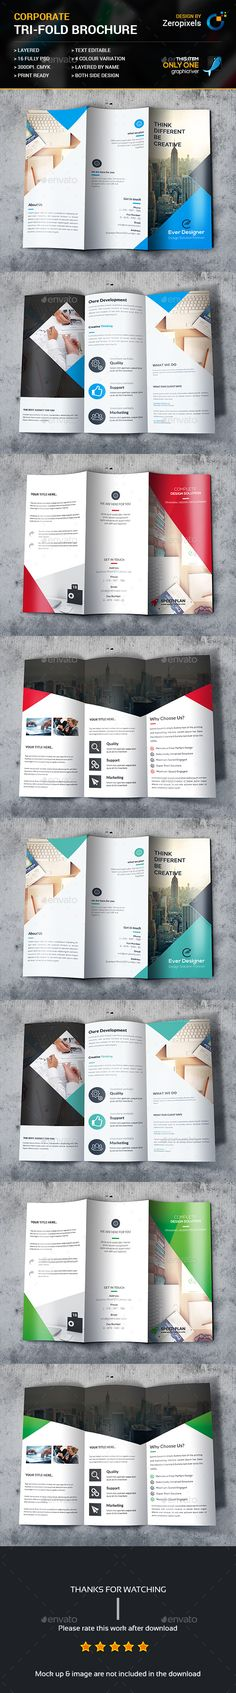 Trifold Brochure Template PSD Bundle